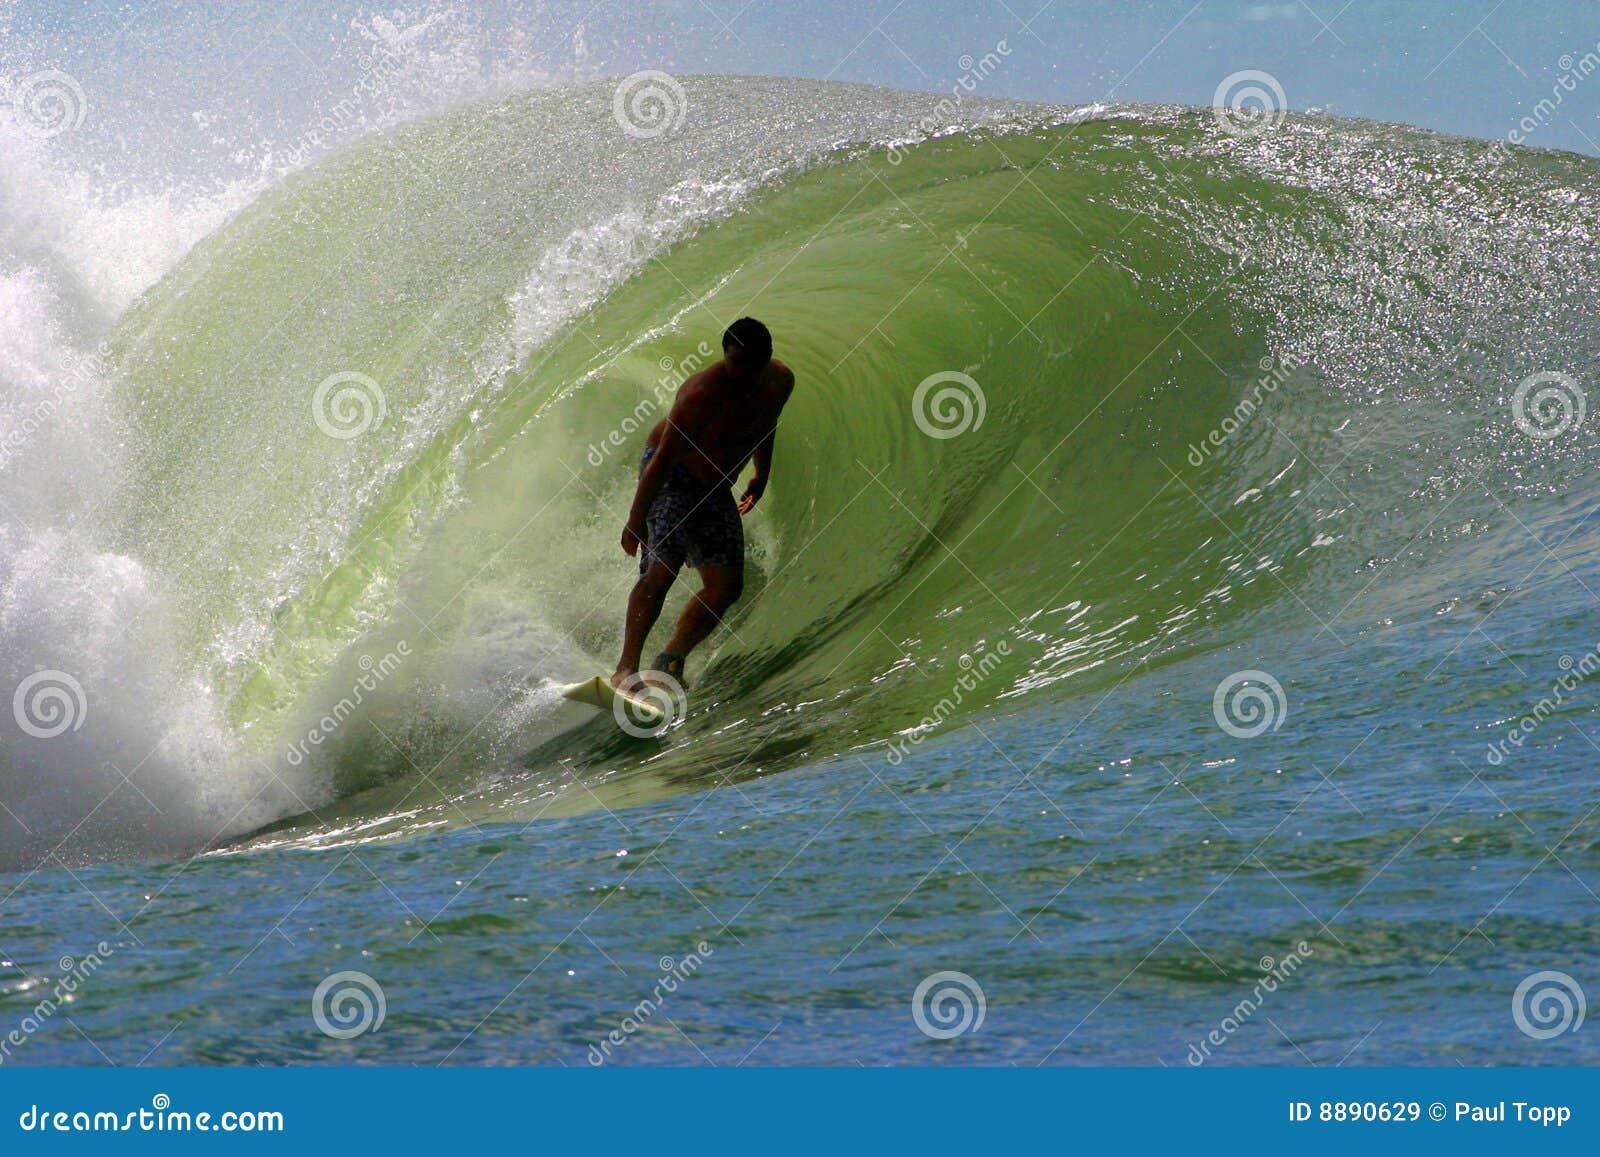 Surfingowa surfingu tubingu fala